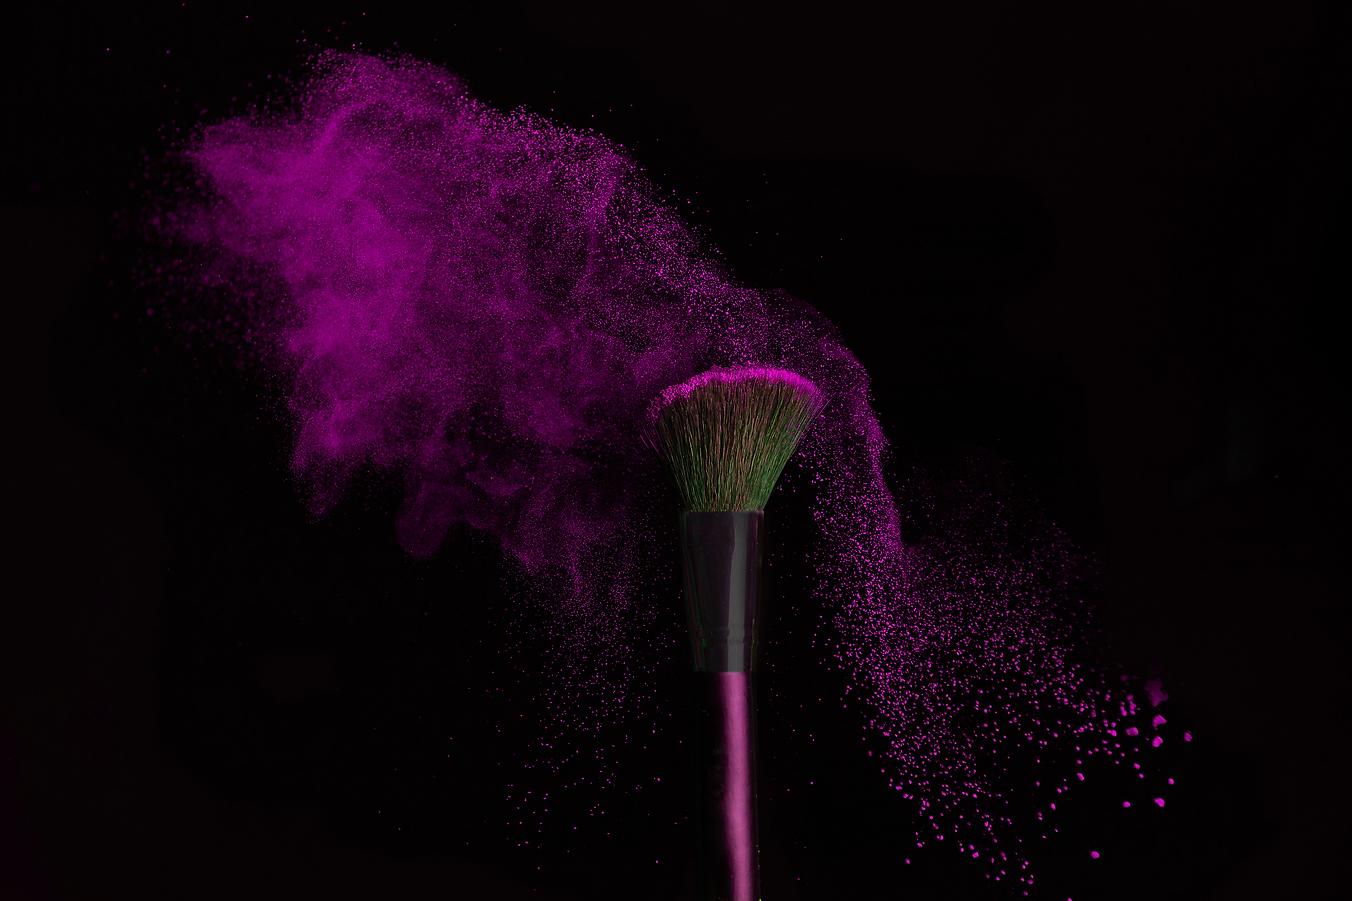 brush 3.png